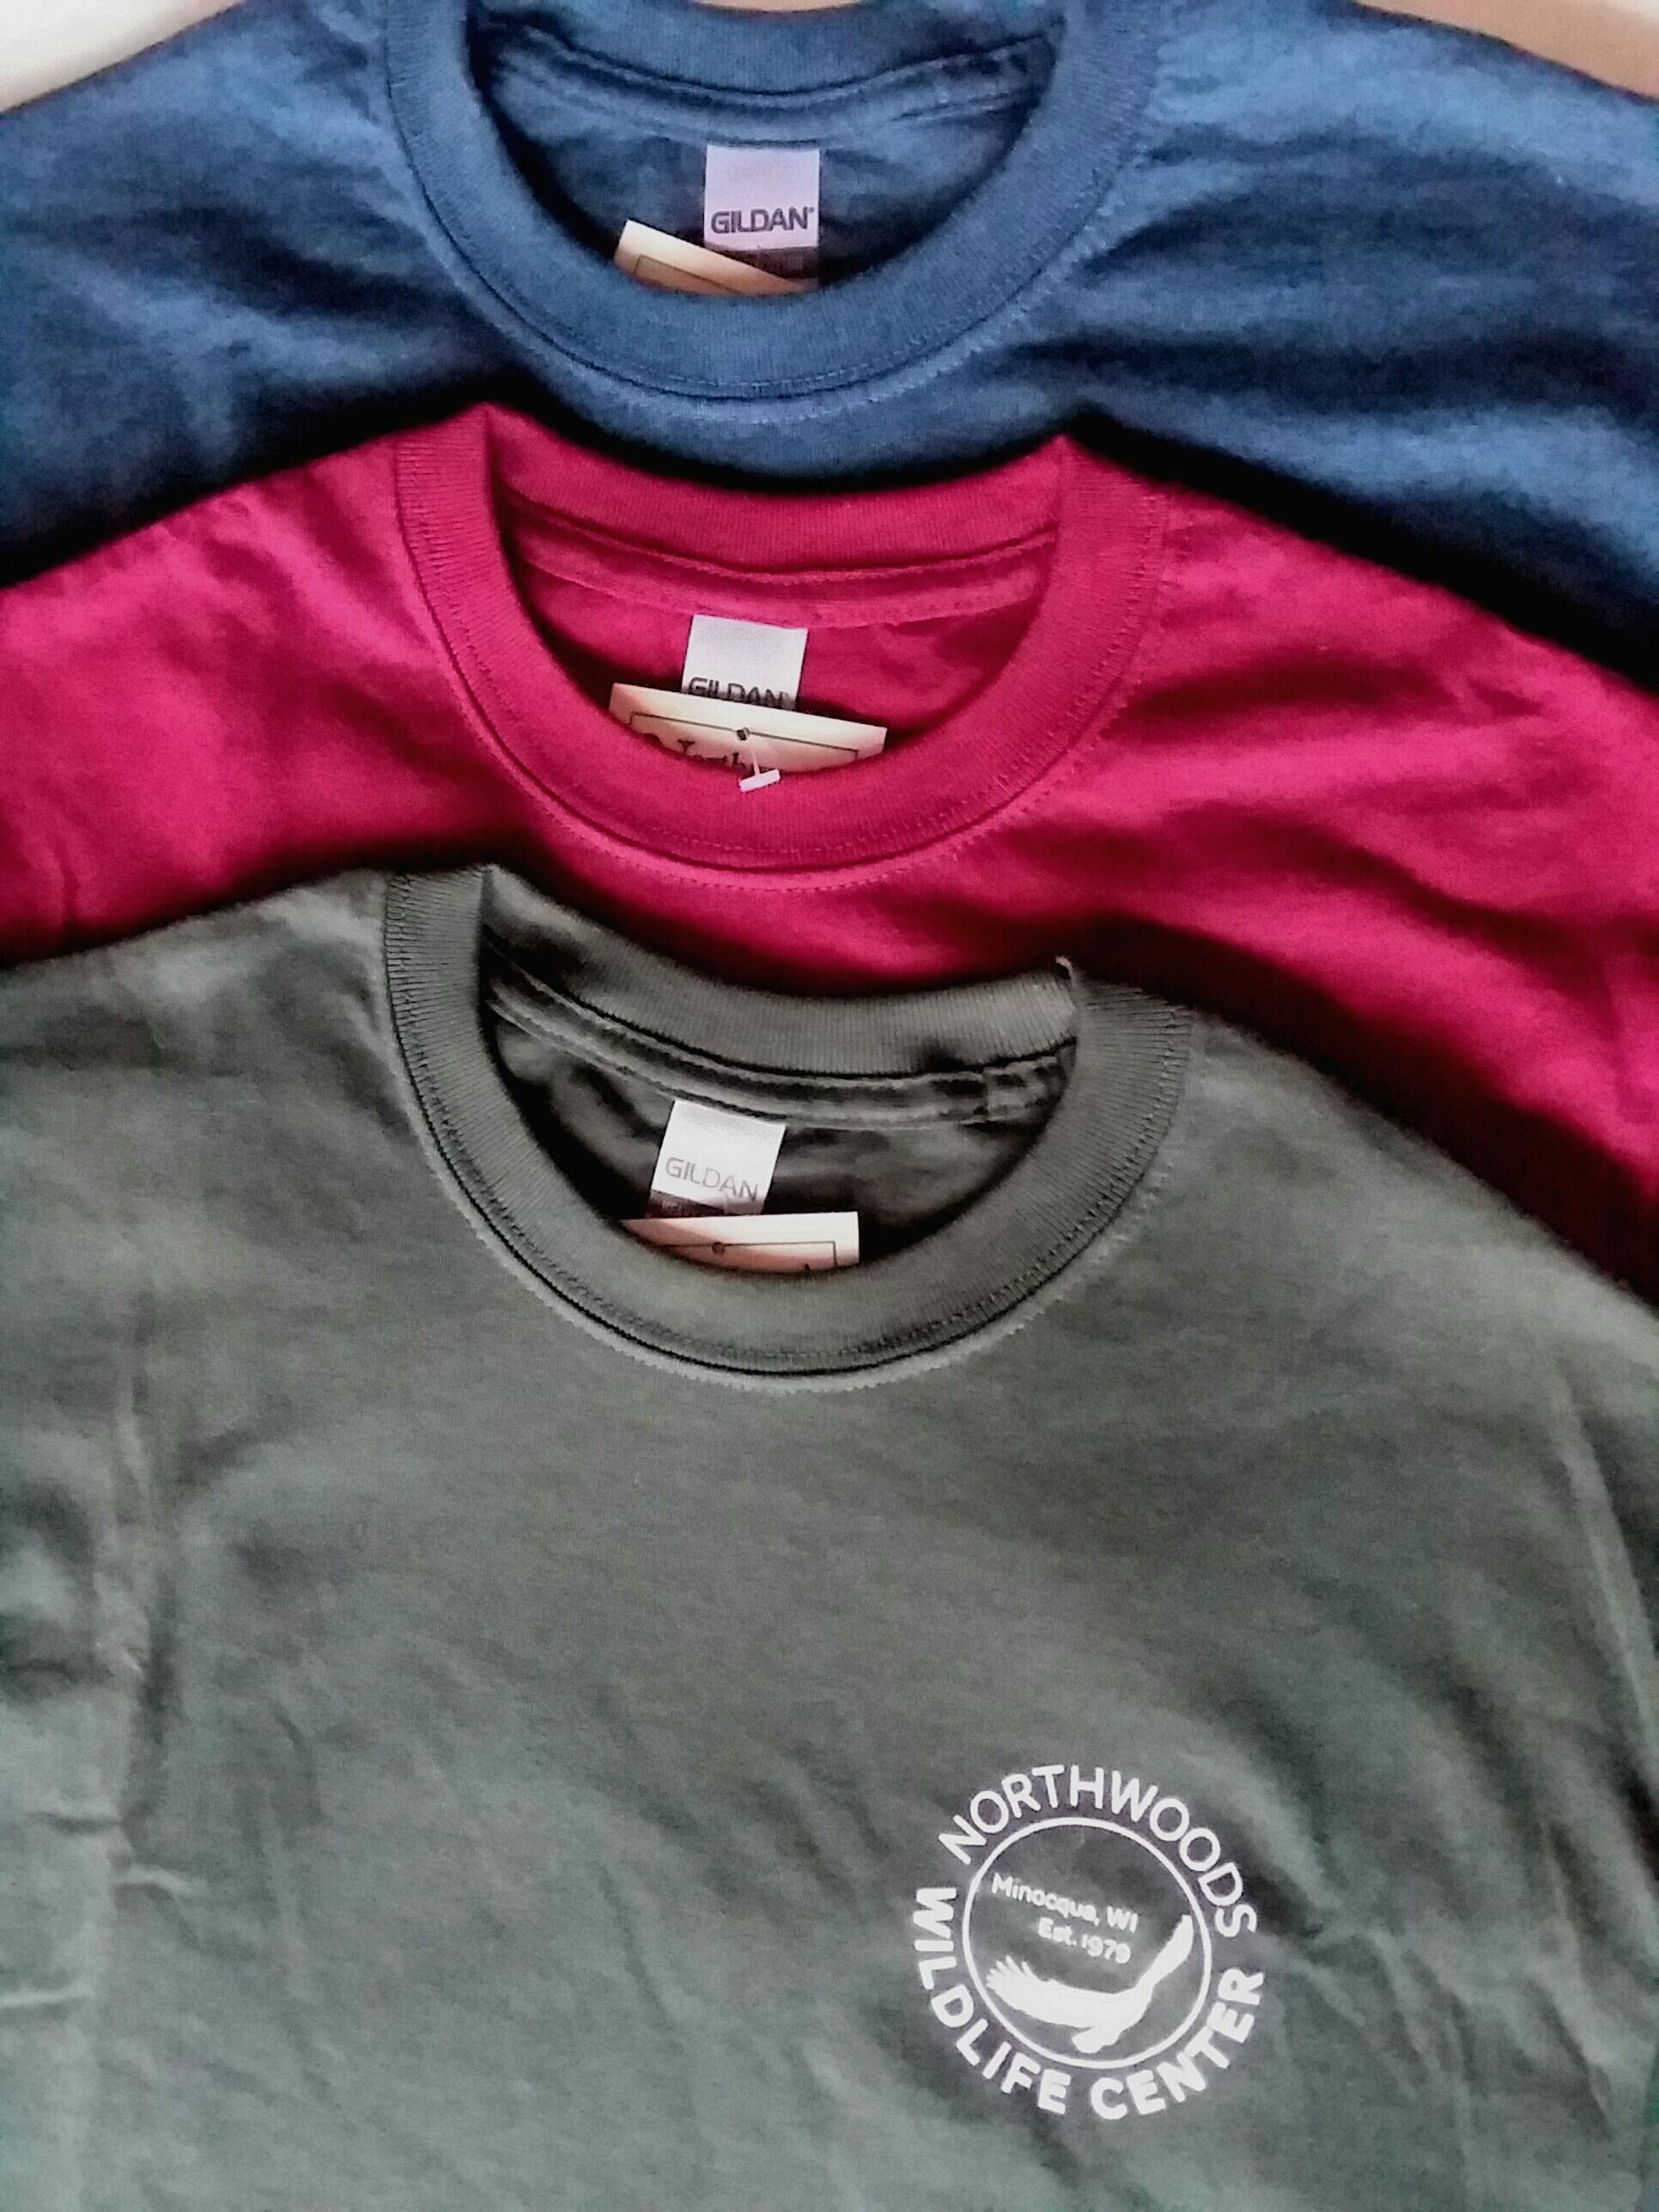 Short Sleeve NWC Logo T-Shirts $15 + $4 shipping per shirt